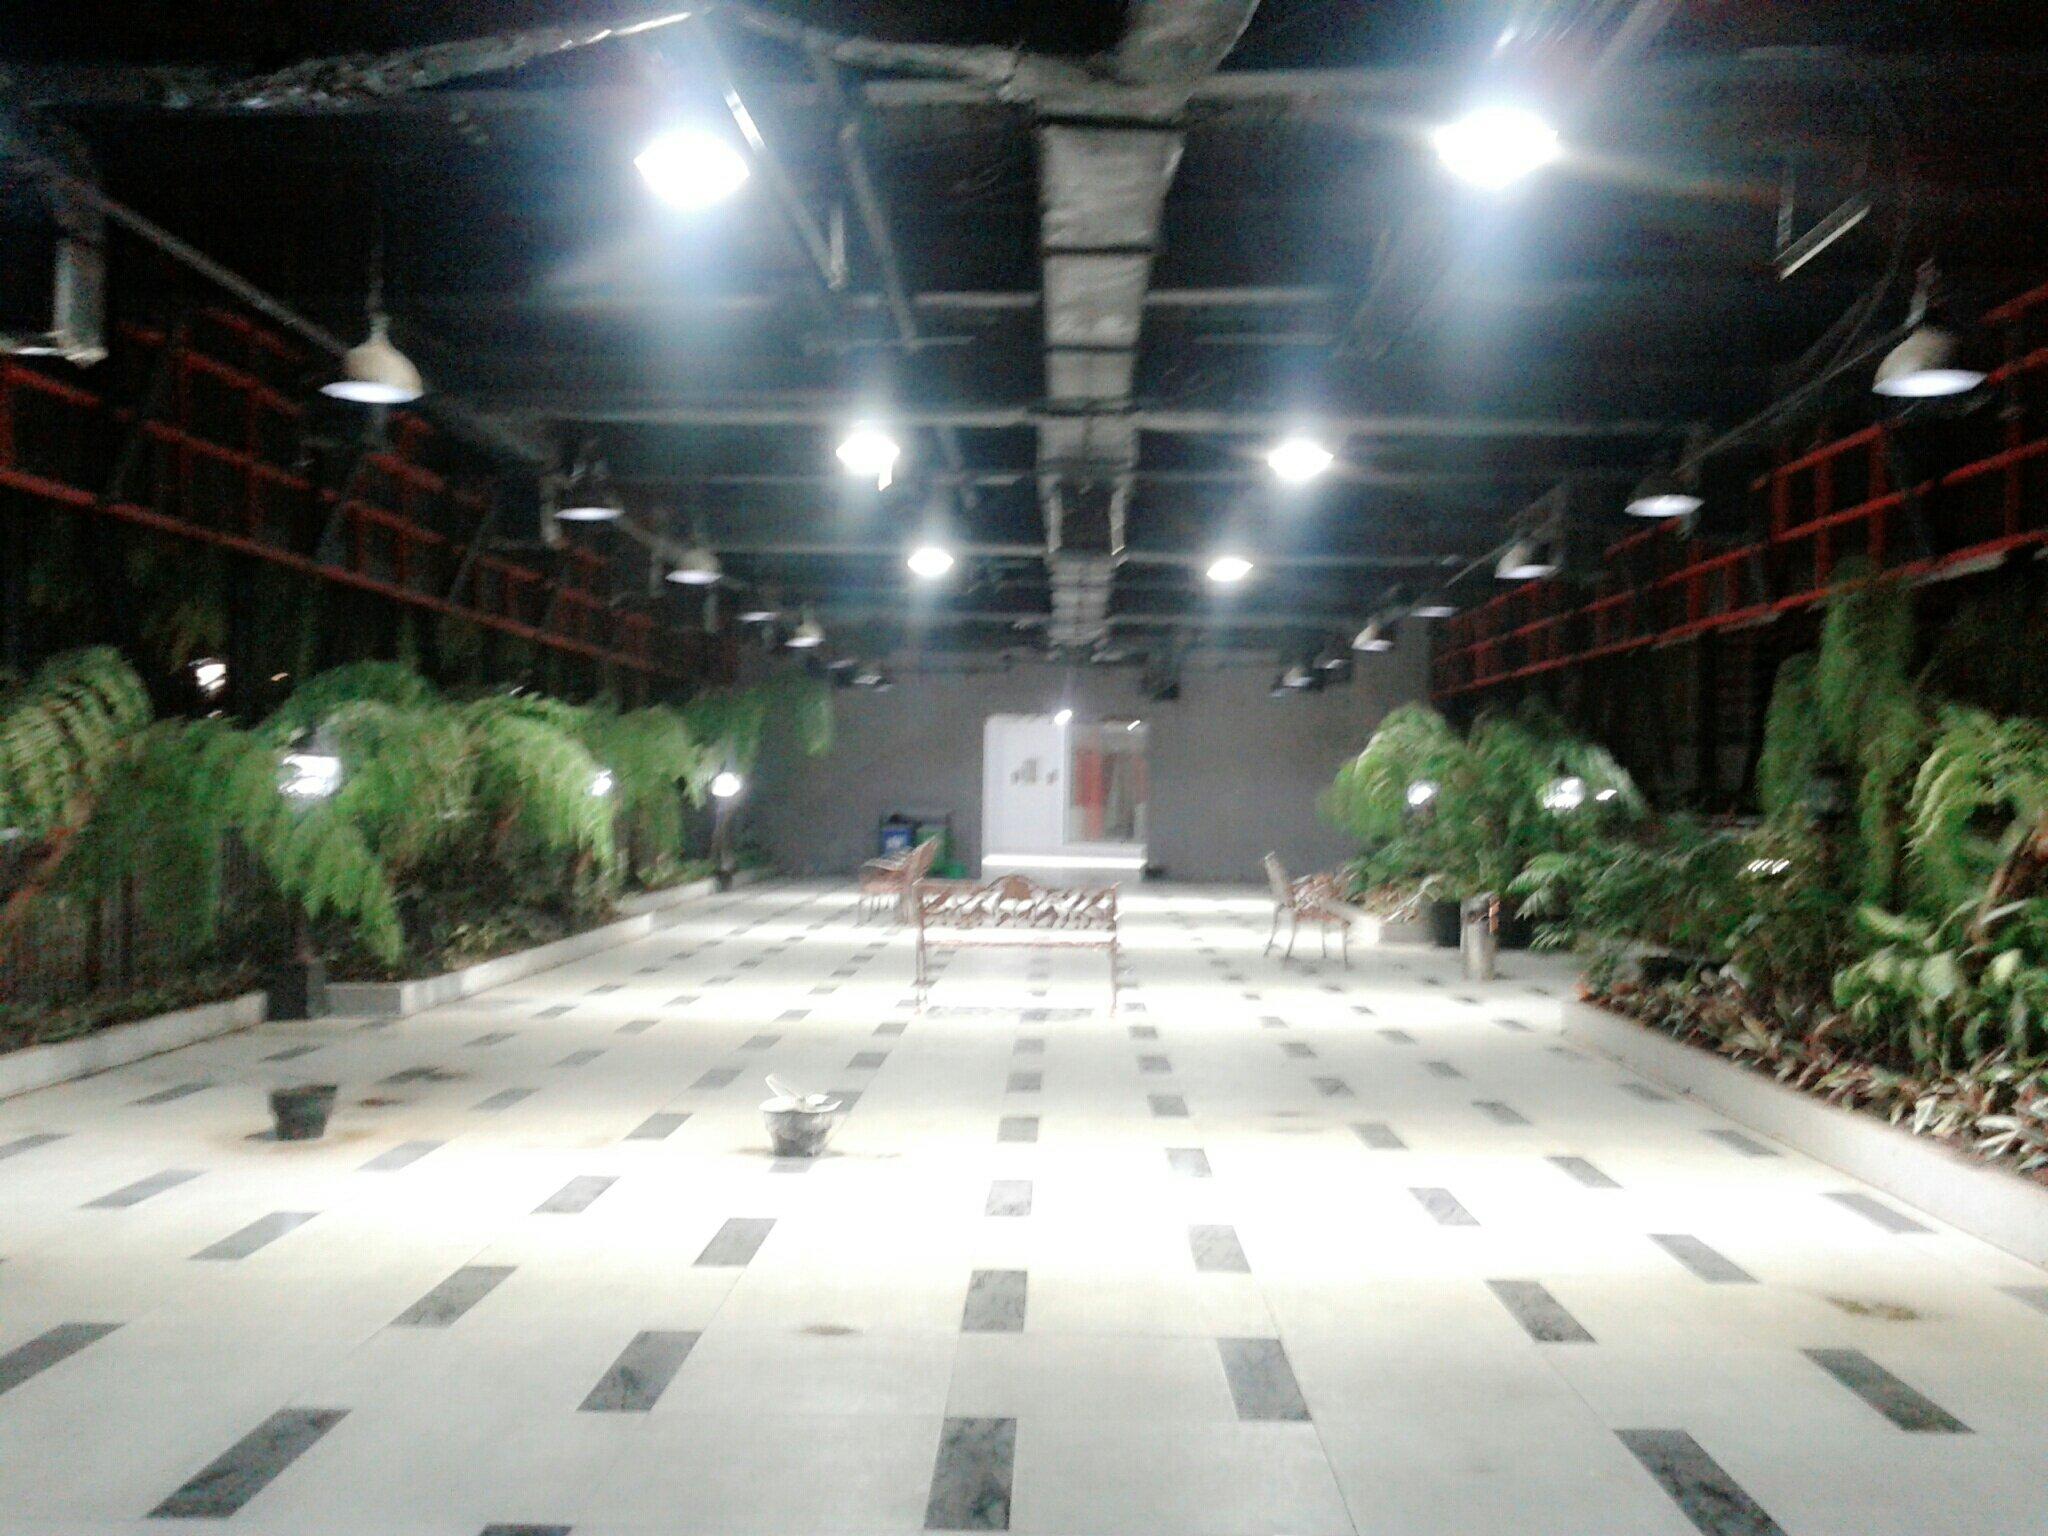 Taman Gantung Menggantung Tengah Kota Surabaya Anisfa Maklum Beliau Dulu